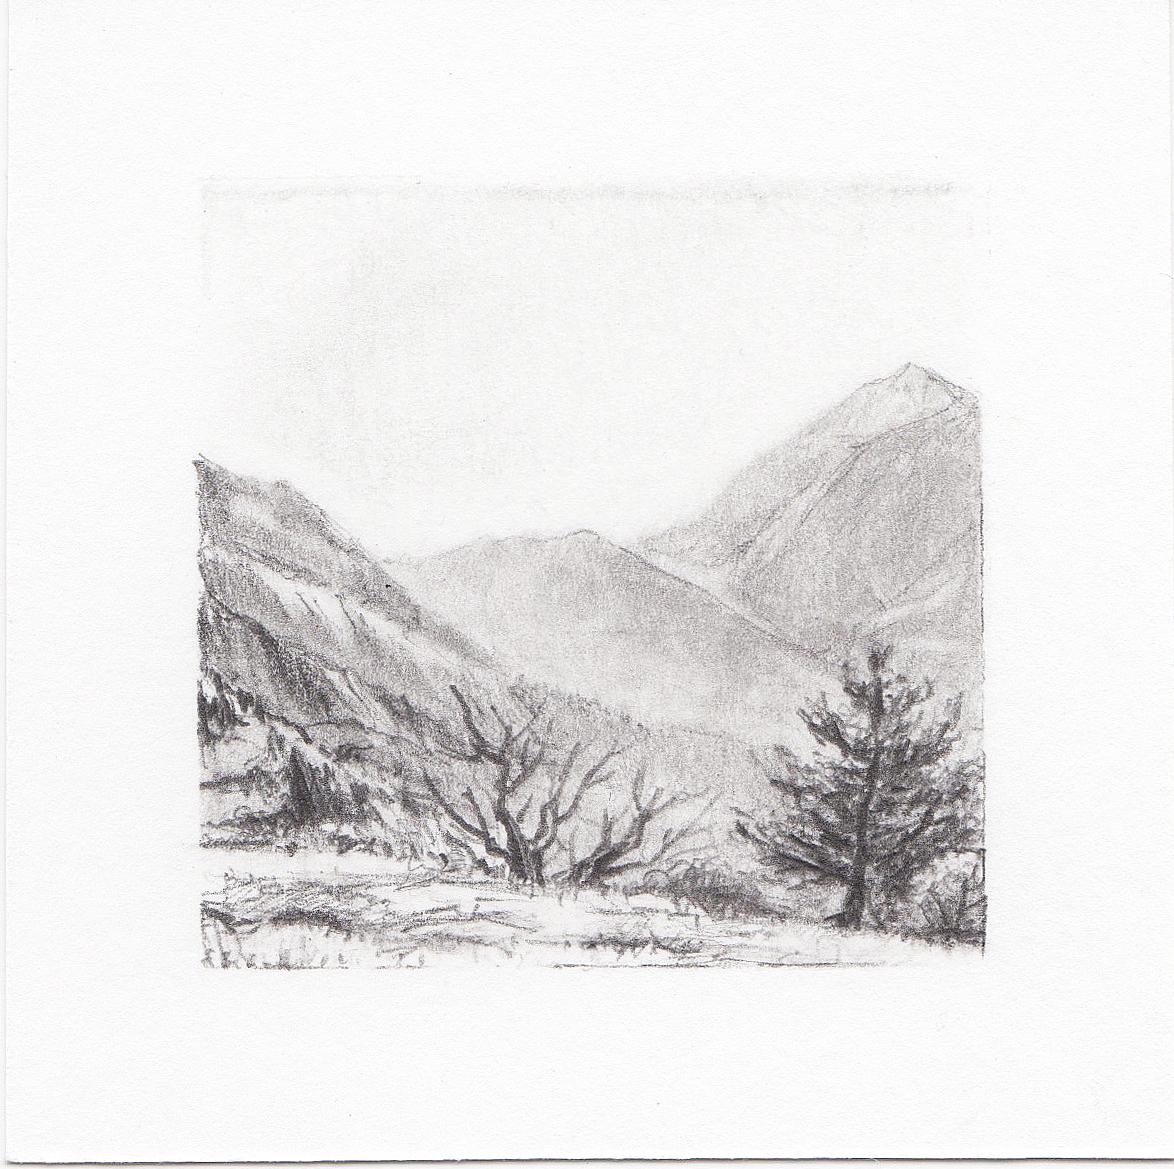 #50 Lone Peak, Wasatch Mountains, Utah | 3x3 | graphite